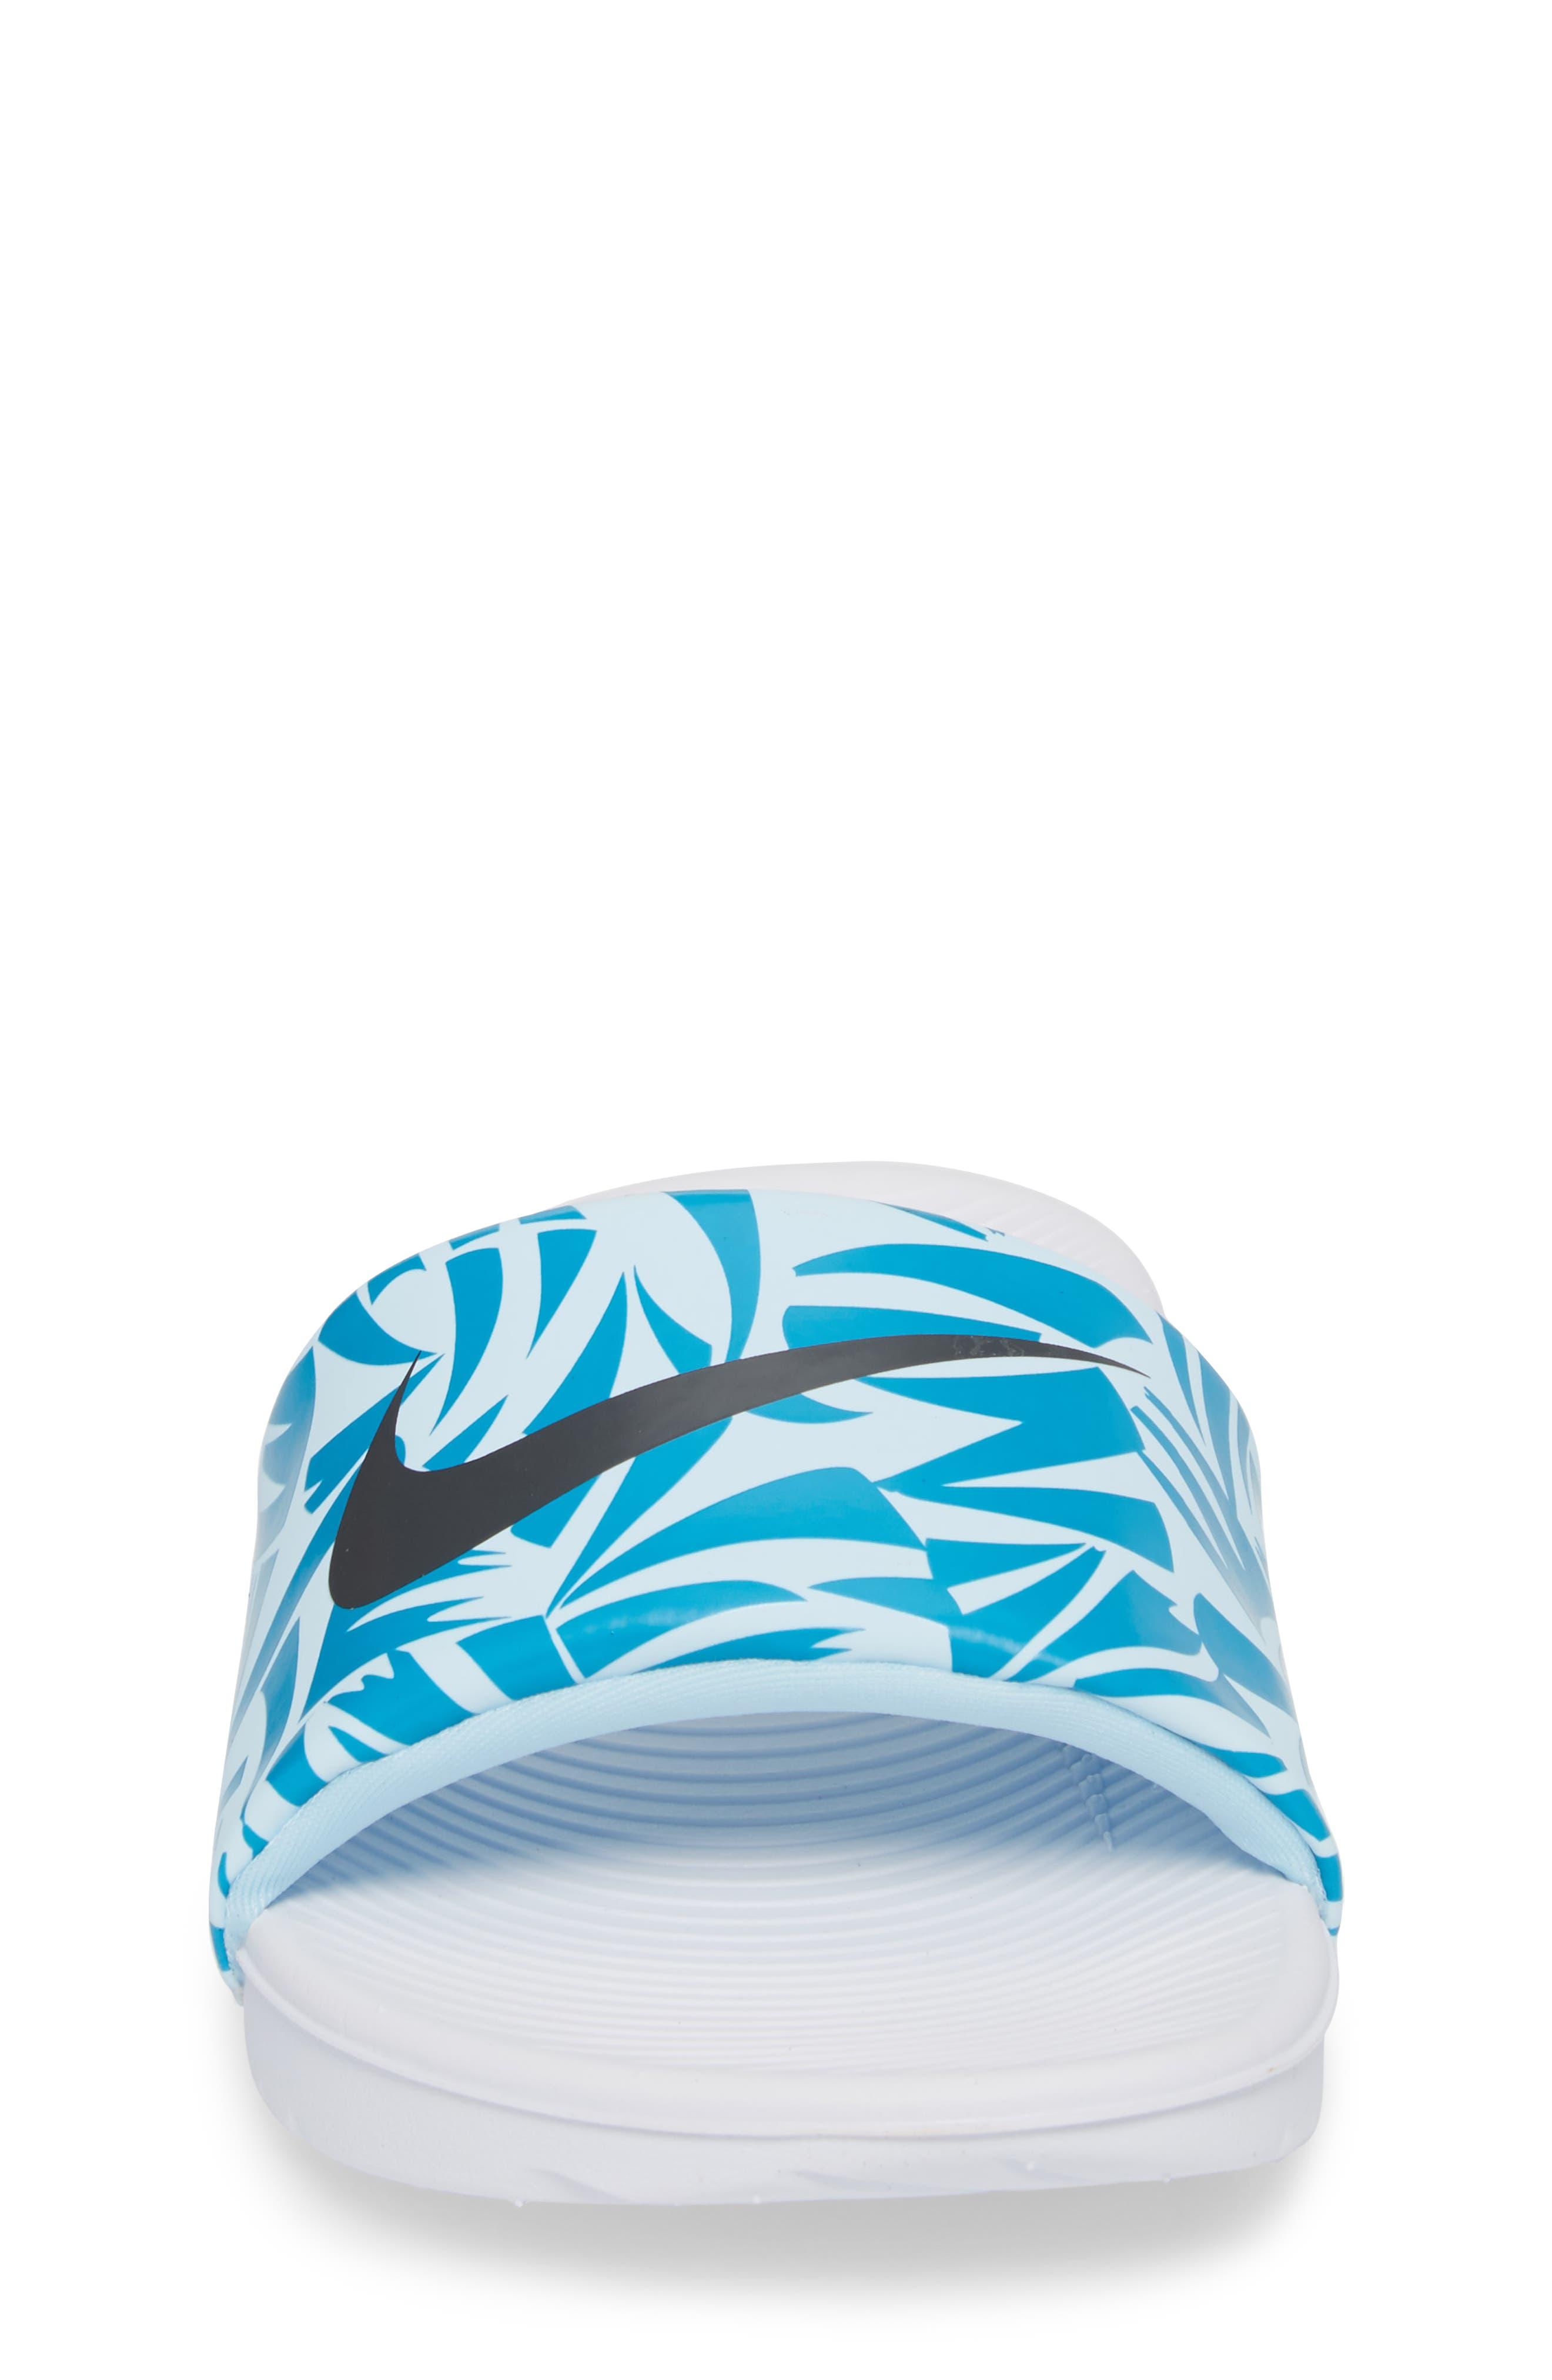 'Kawa' Print Slide Sandal,                             Alternate thumbnail 4, color,                             White/ Anthracite/ Turquoise